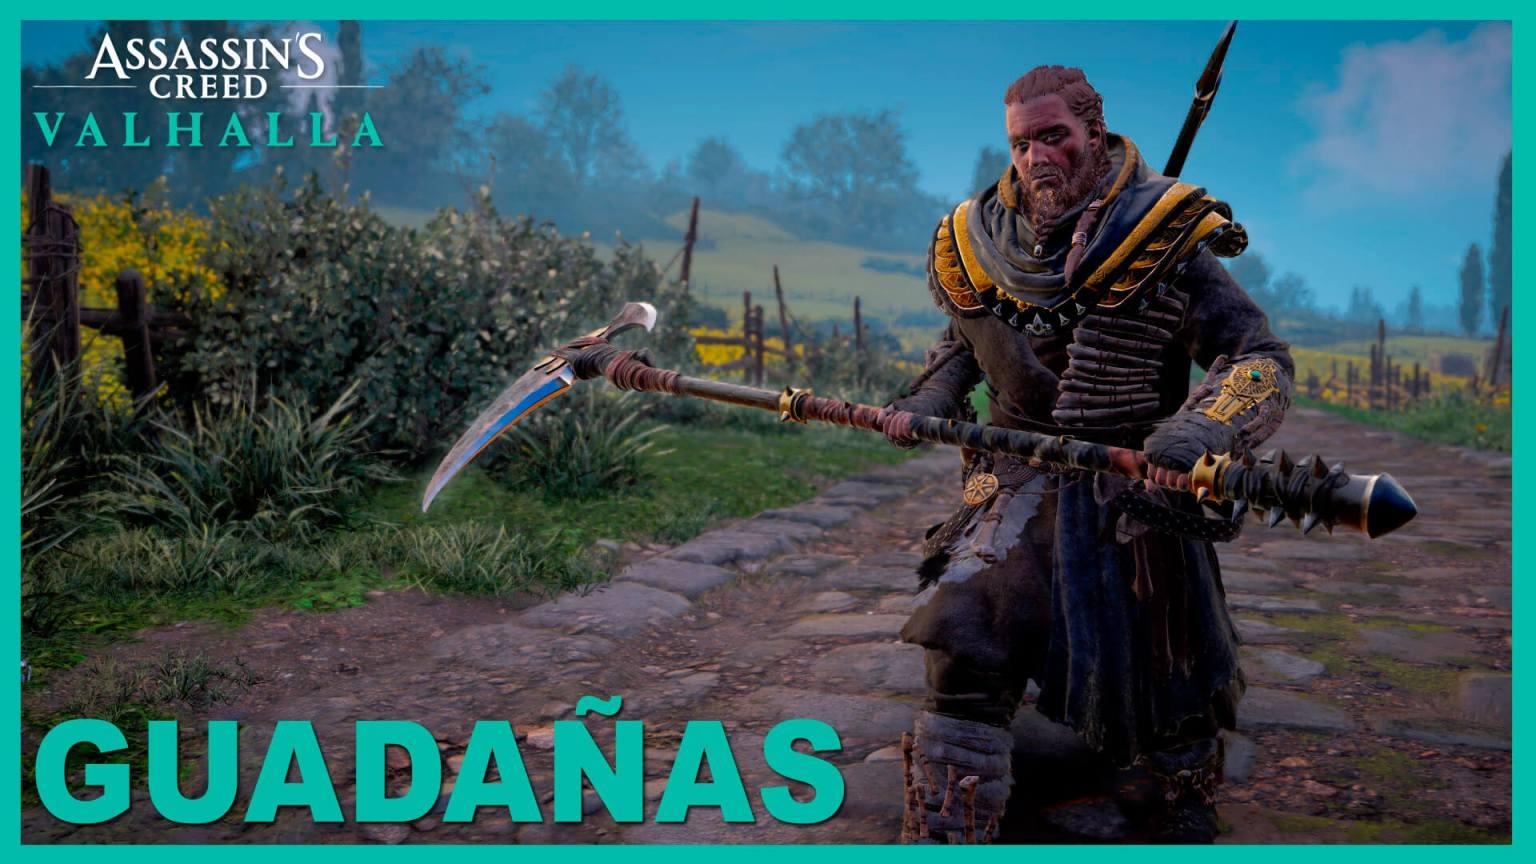 Assassin's Creed Guadañas